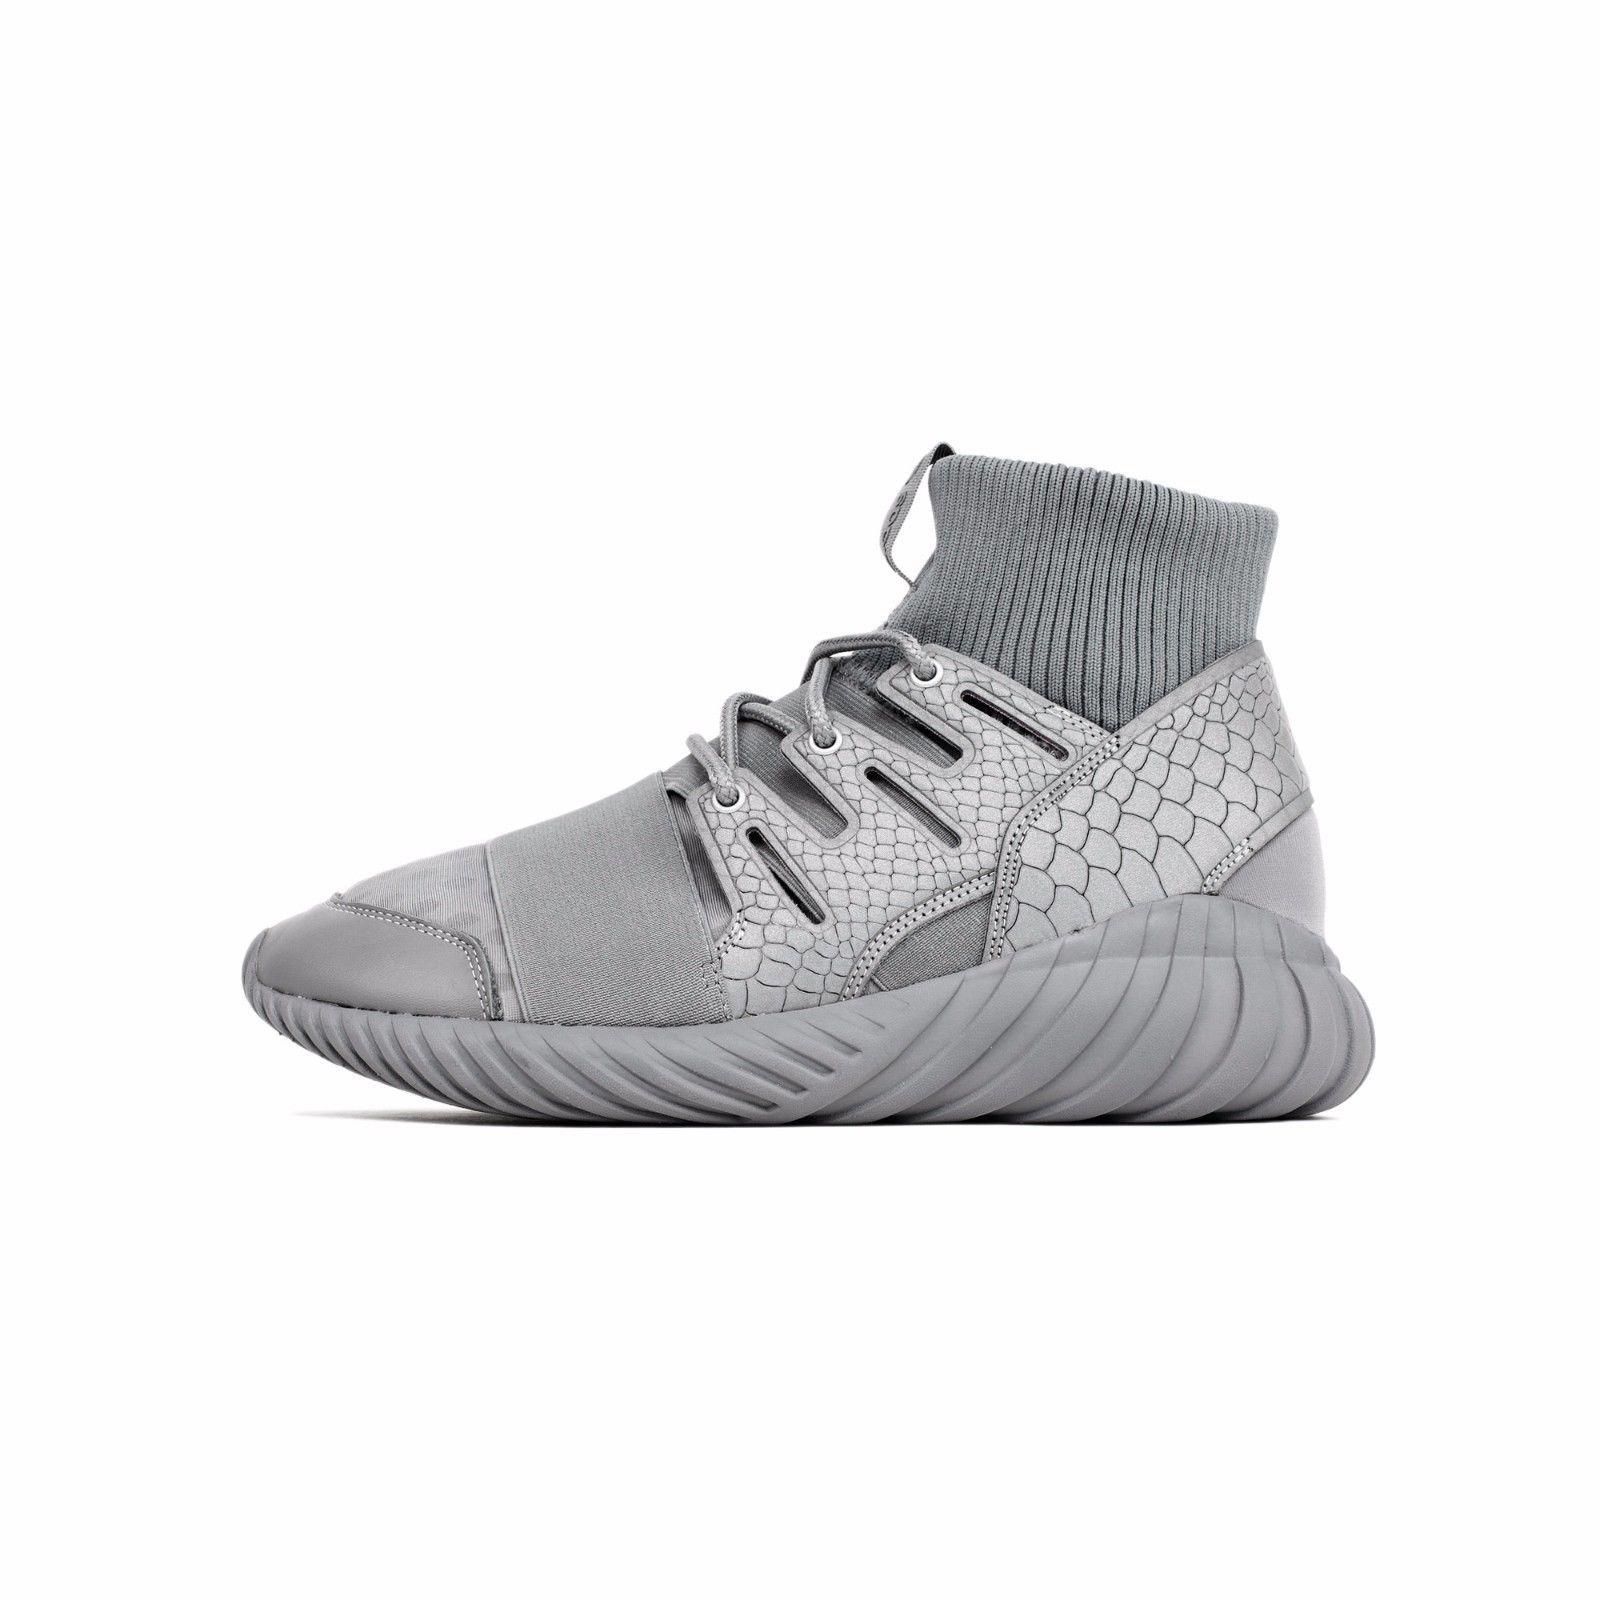 18c32a36abecb NEW Adidas Tubular Runner Doom Grey Fashion Week 3m Reflective Scale S74791  S 13